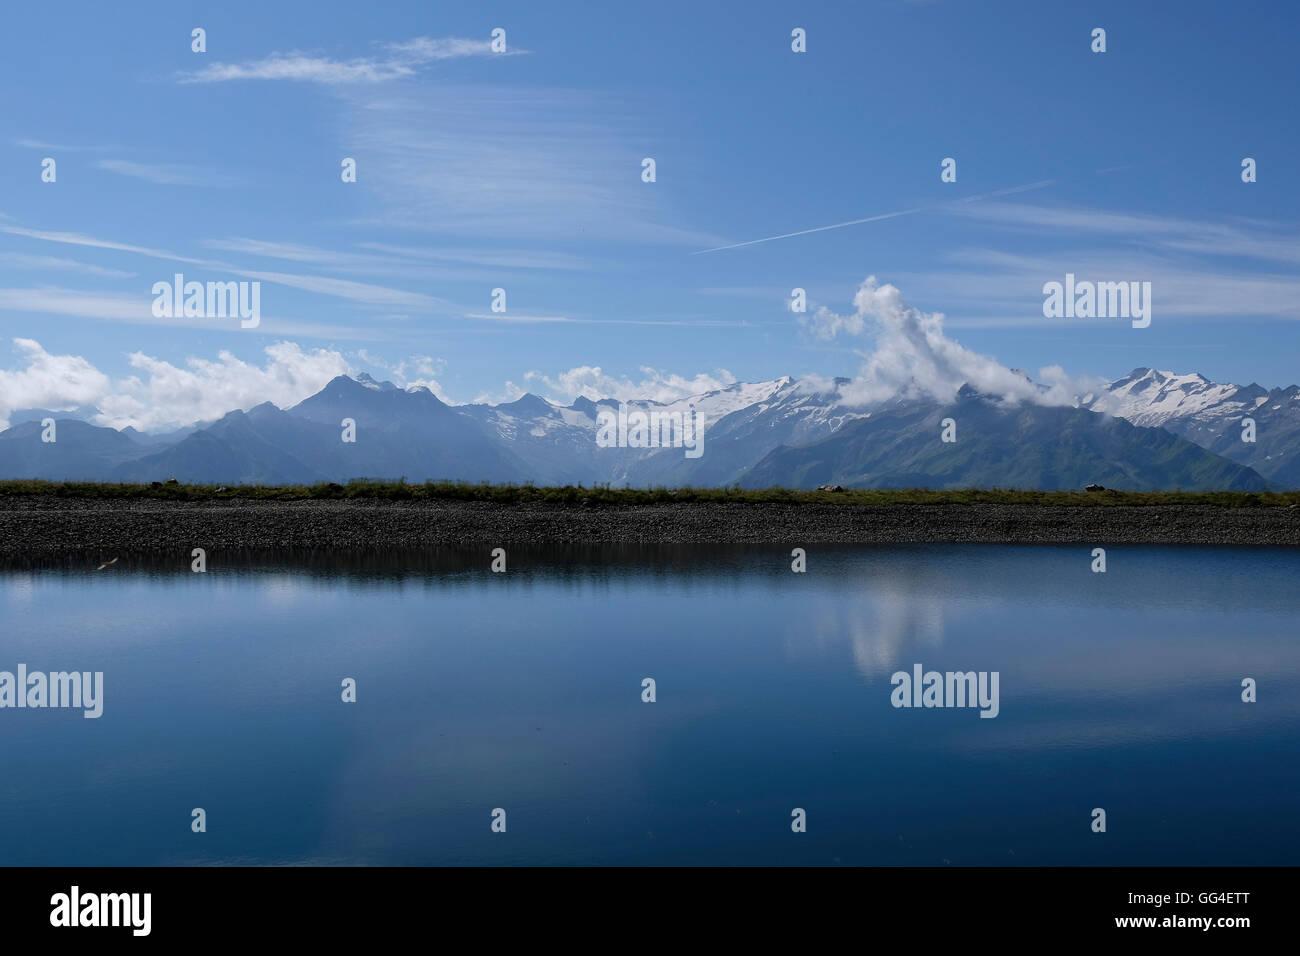 Lake in the Austrian alps. - Stock Image